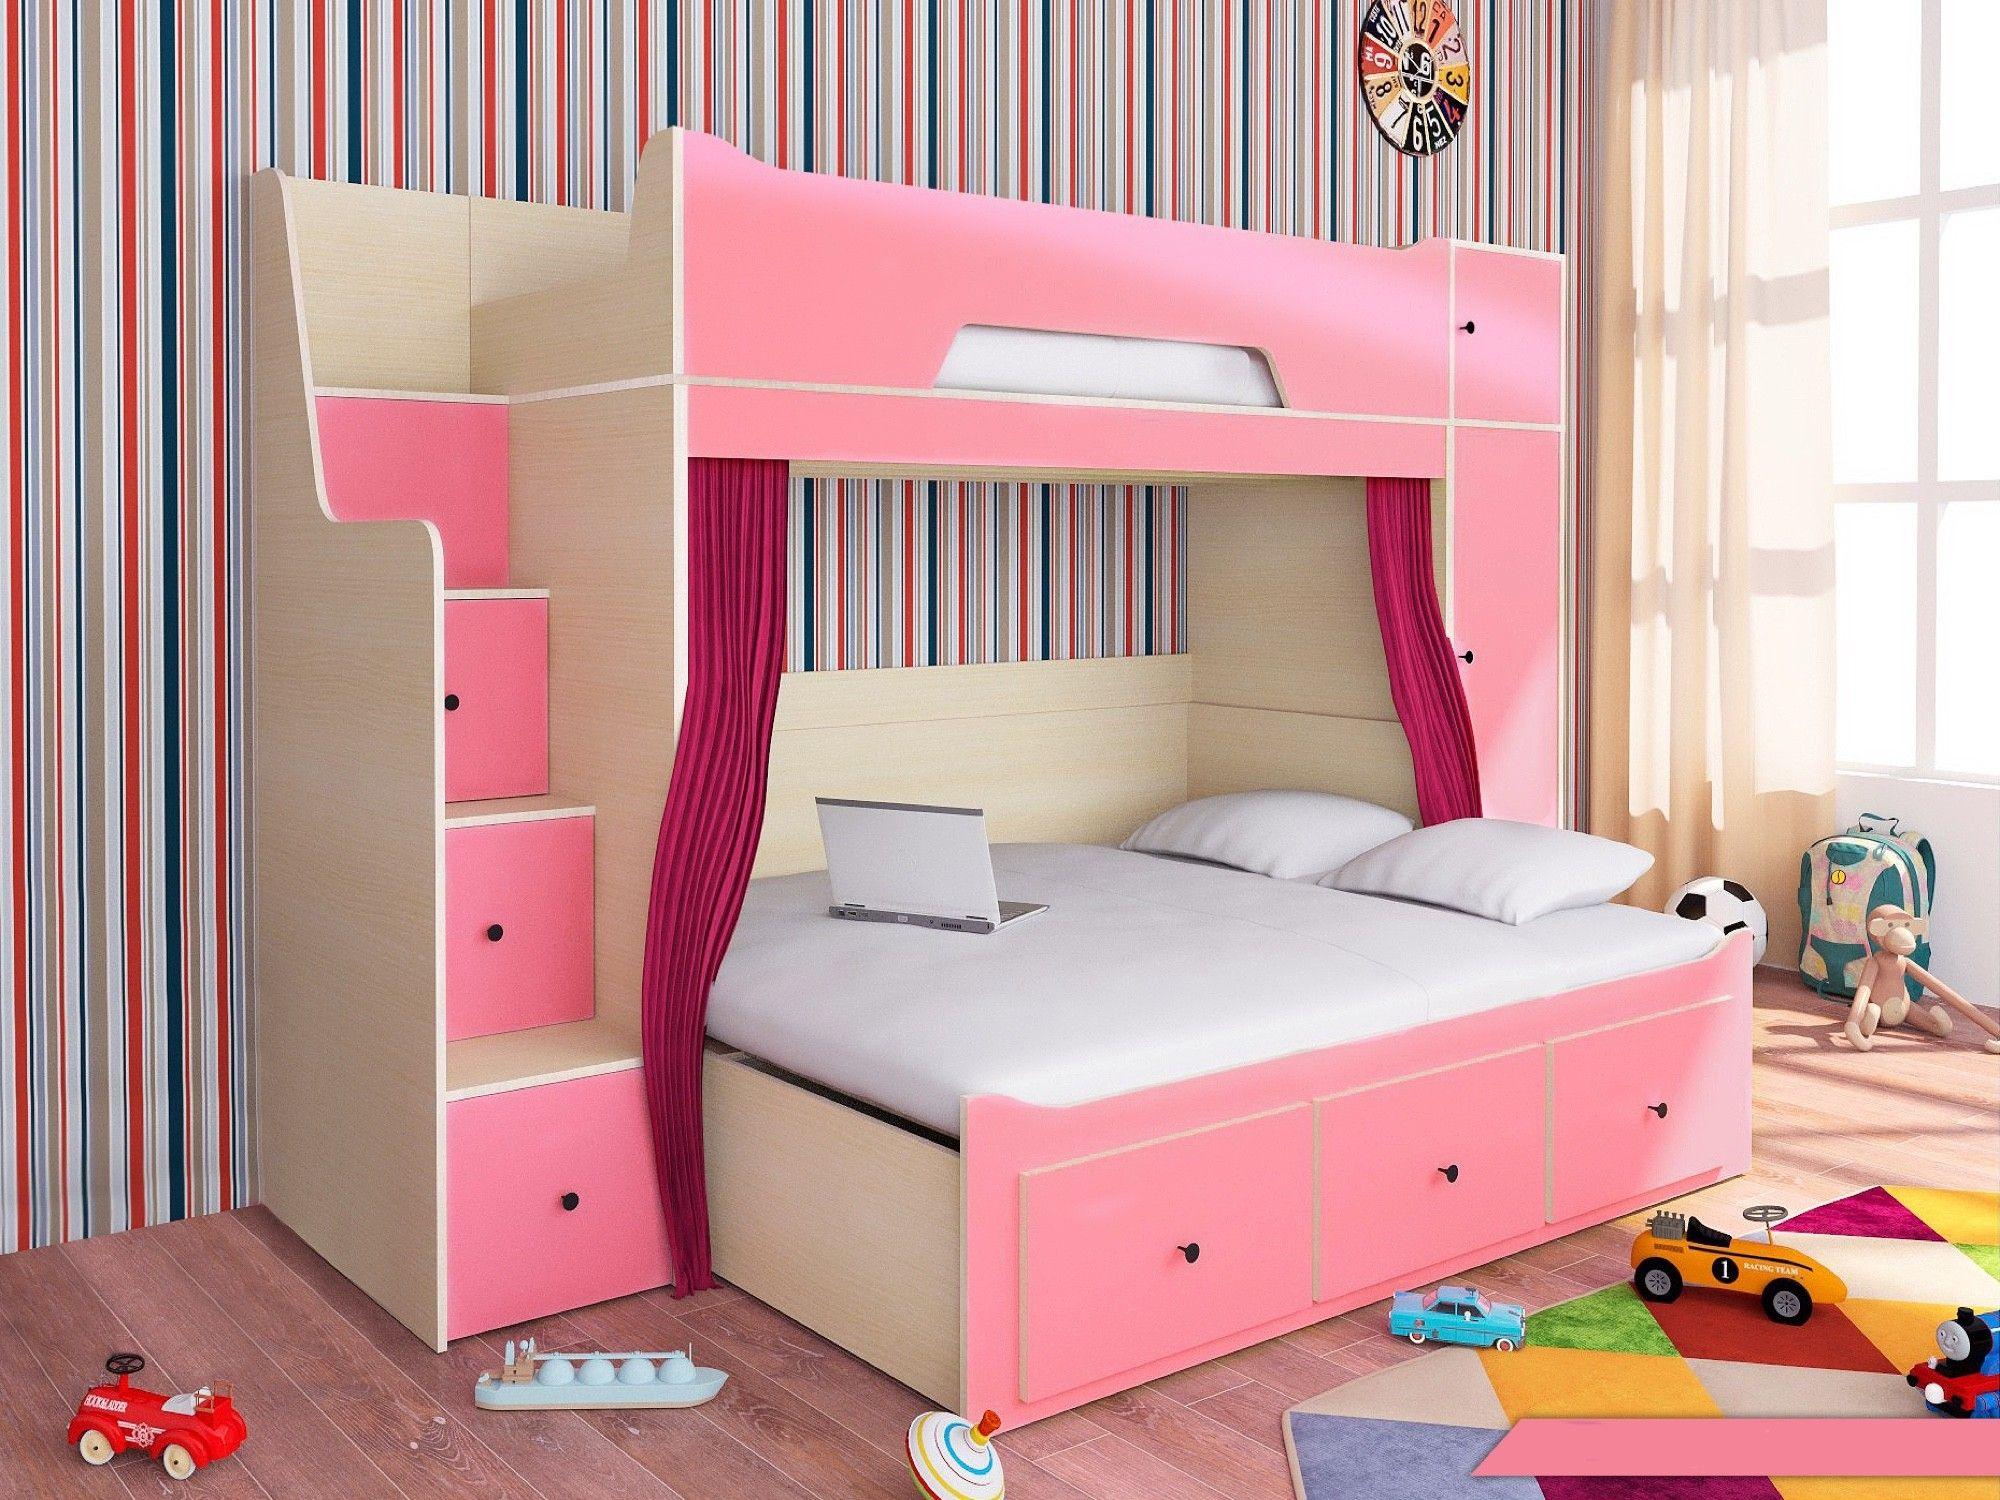 Etagenbett Pink : Etagenbett softy kinder komfort